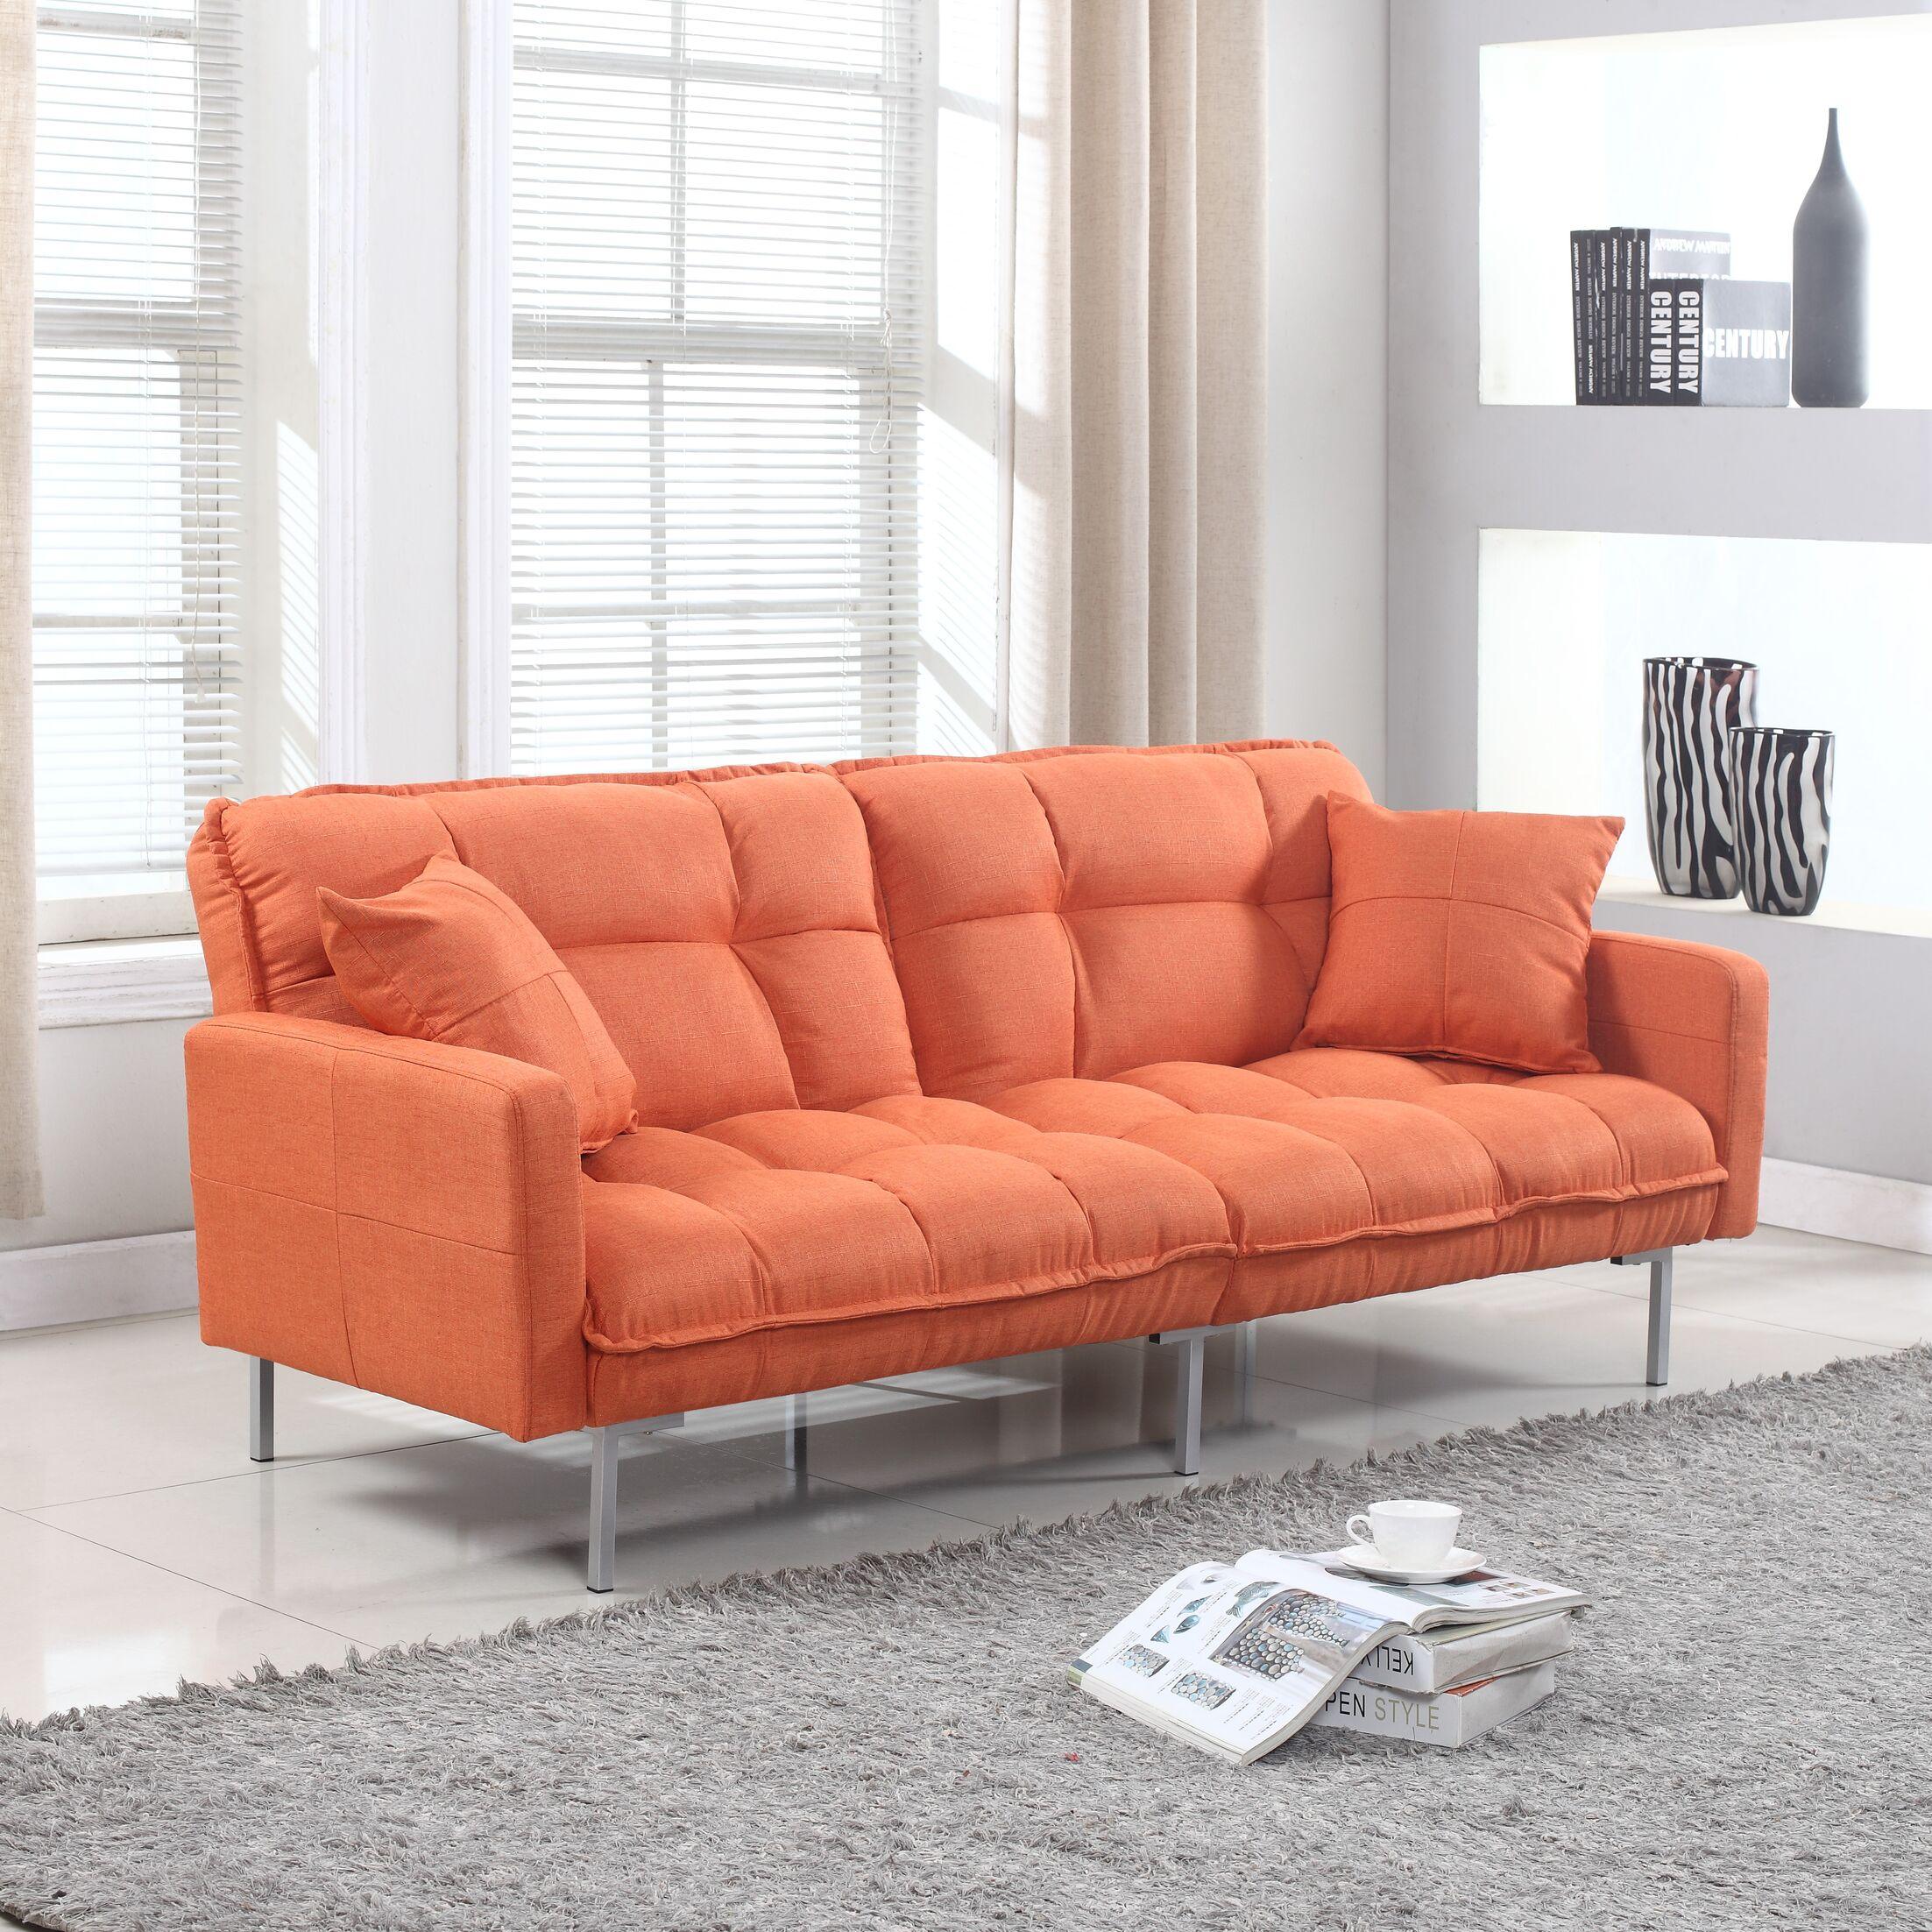 Modern Plush Tufted Convertible Sofa